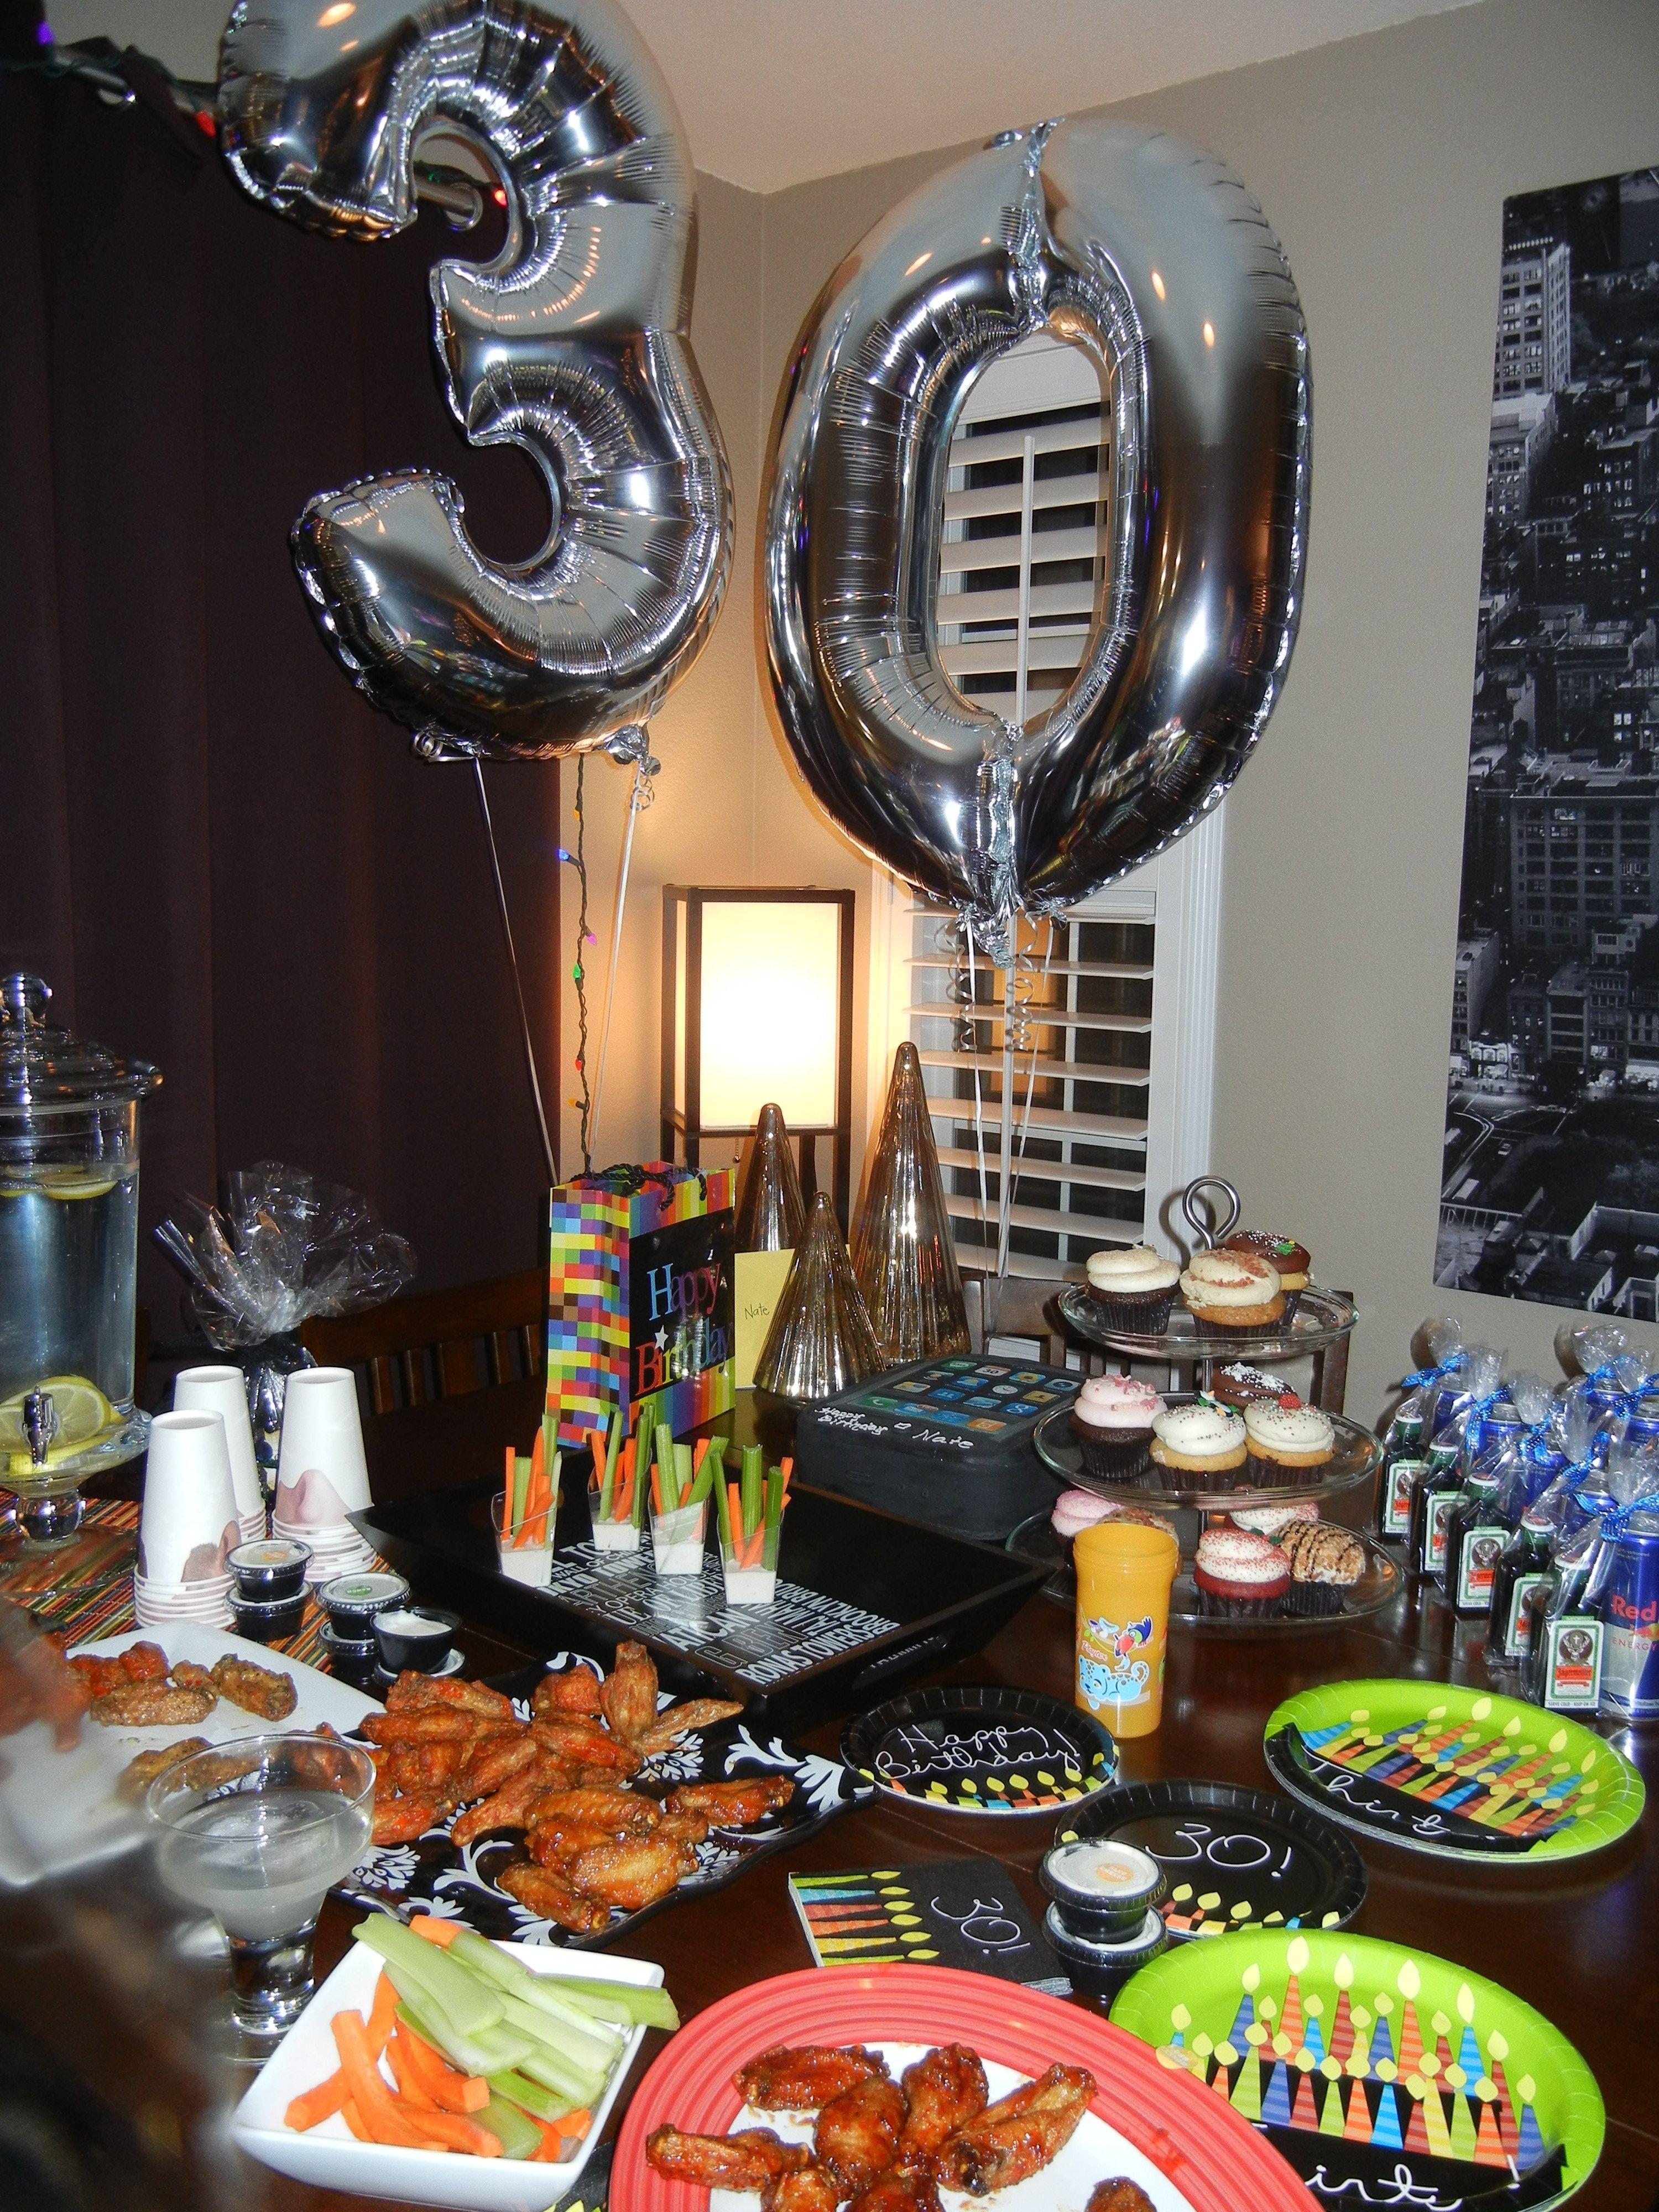 10 Amazing Ideas For 30Th Birthday For Him husbands 30th birthday my stuff pinterest 30 birthday 30th 6